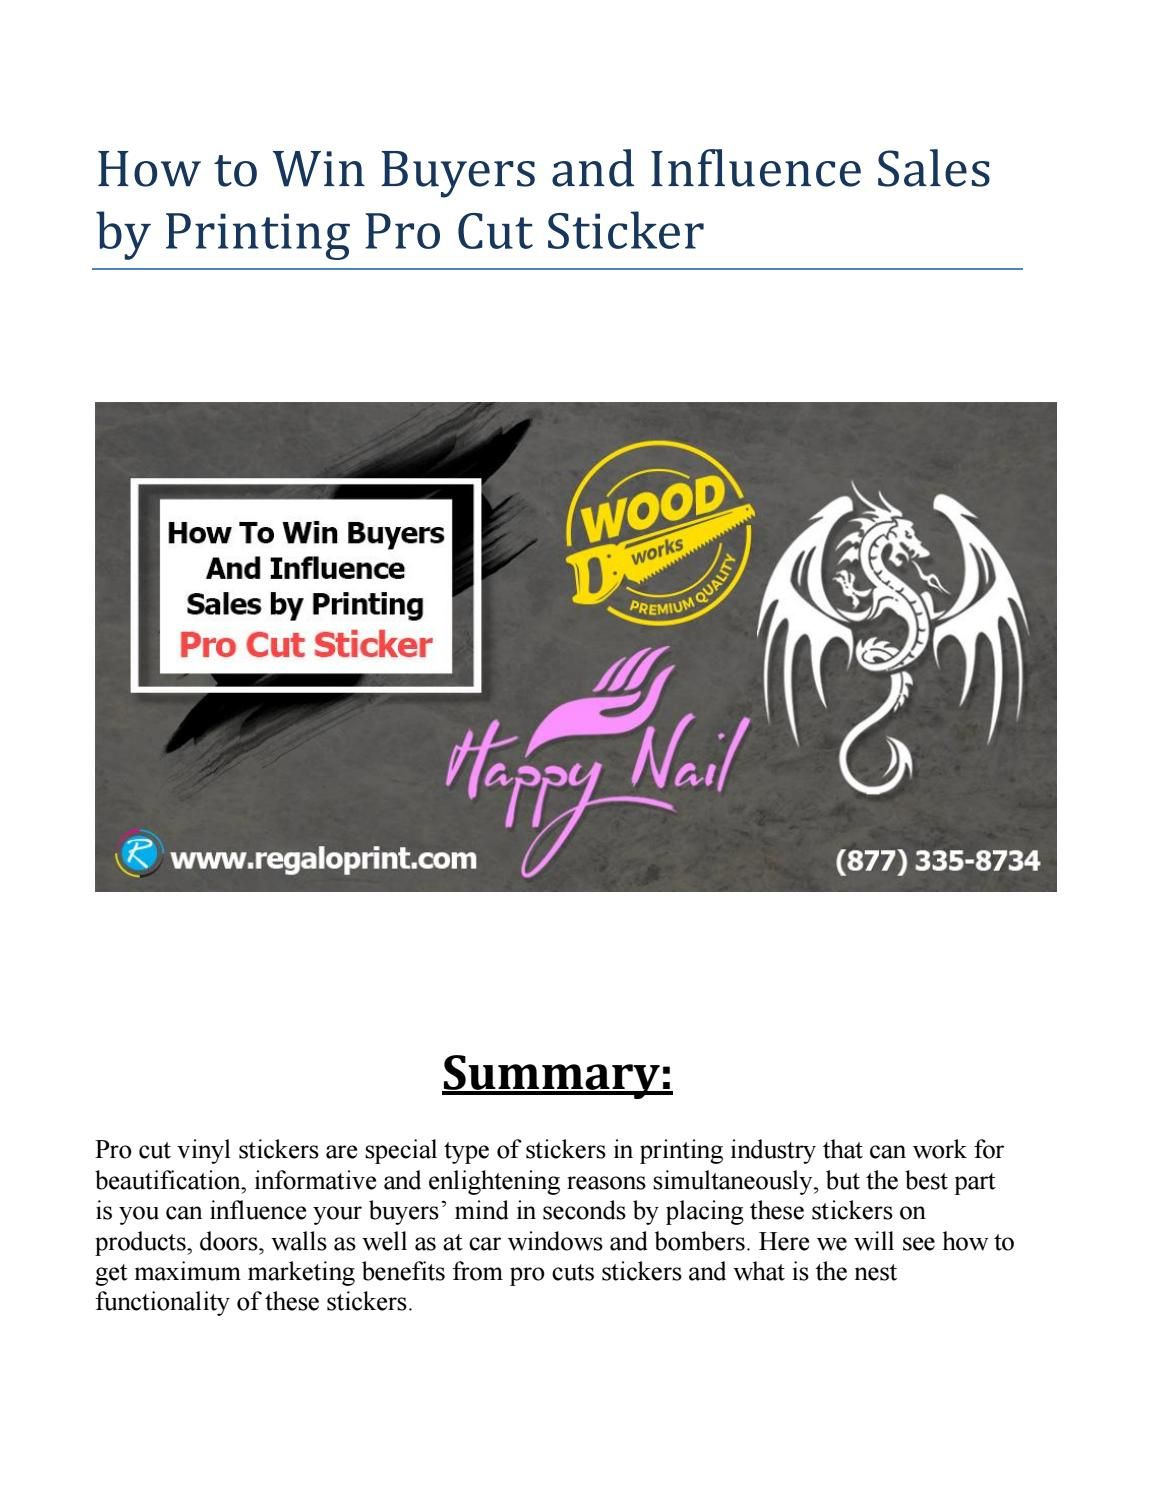 Custom printing printing services